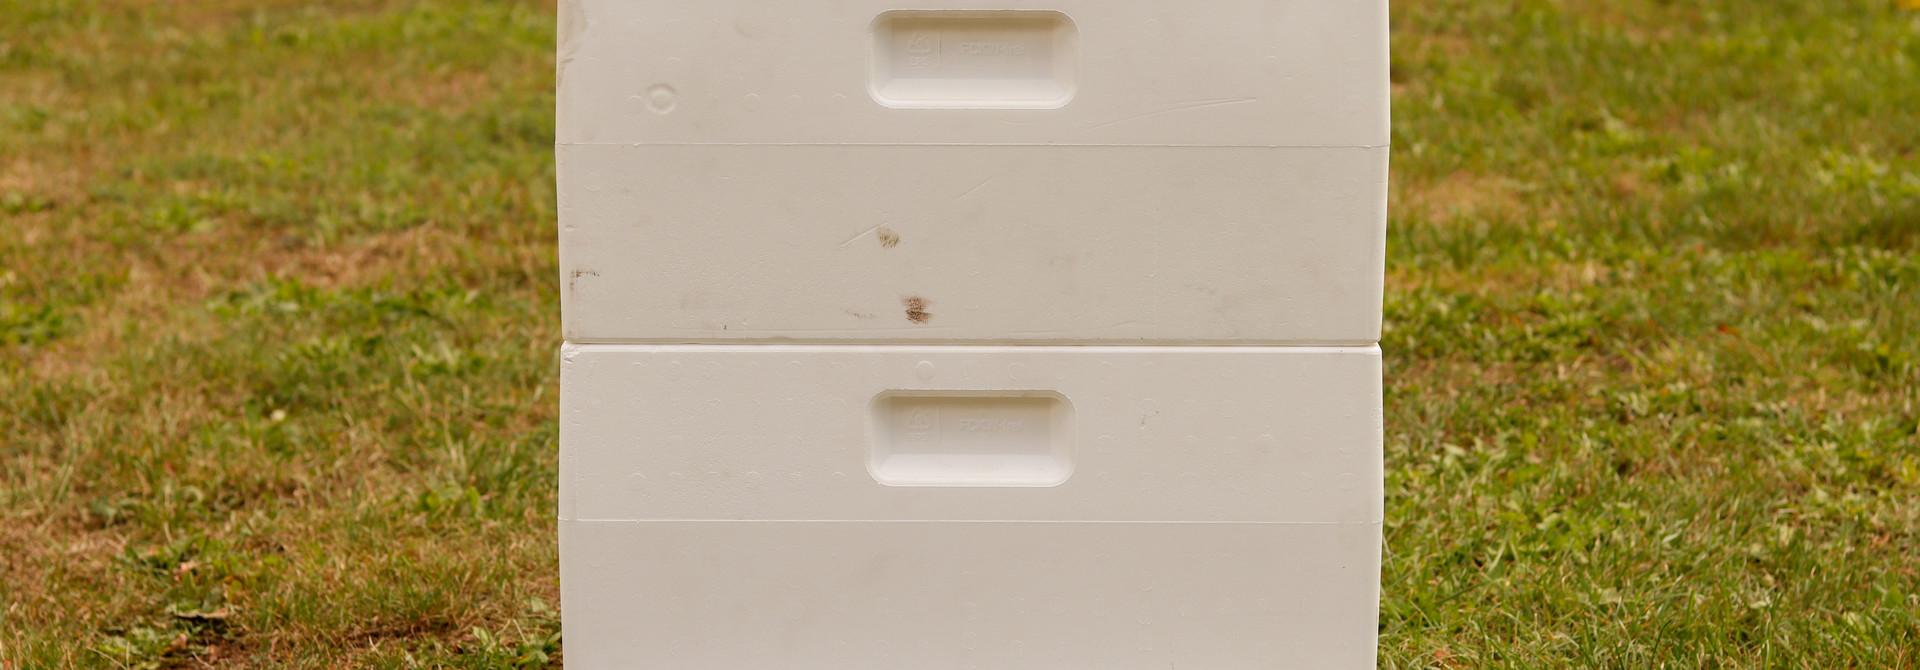 Segebergerkast compleet - vlakke bodem